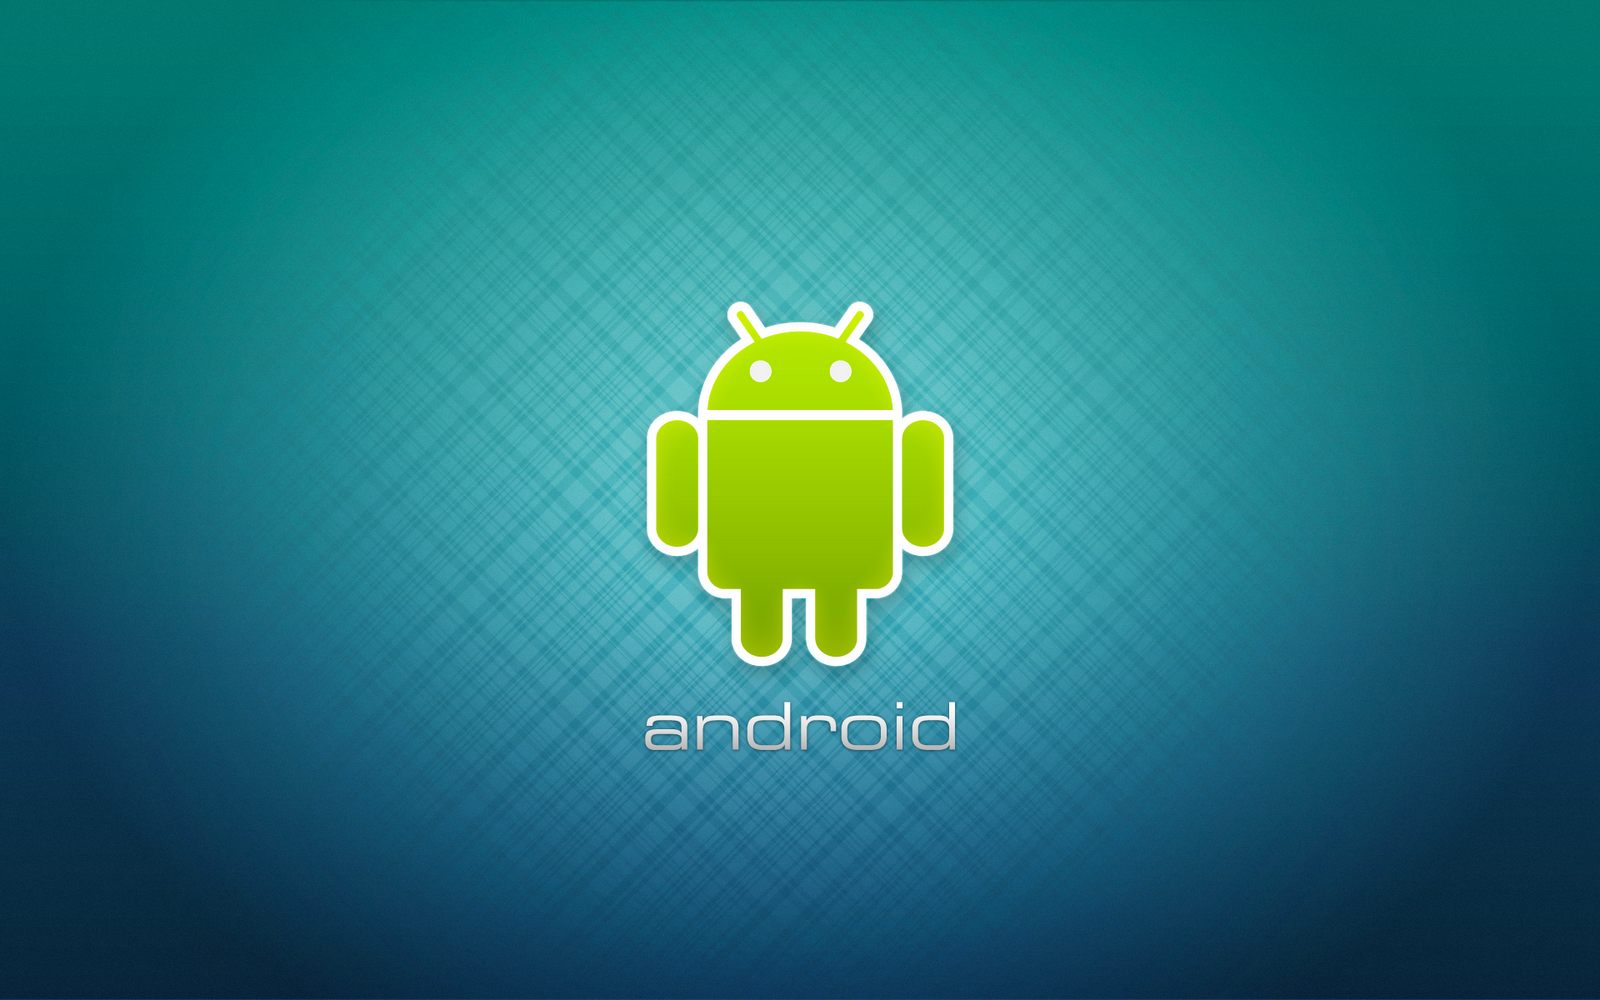 Thomas Kioko Getting Started on Android Development 1600x1000